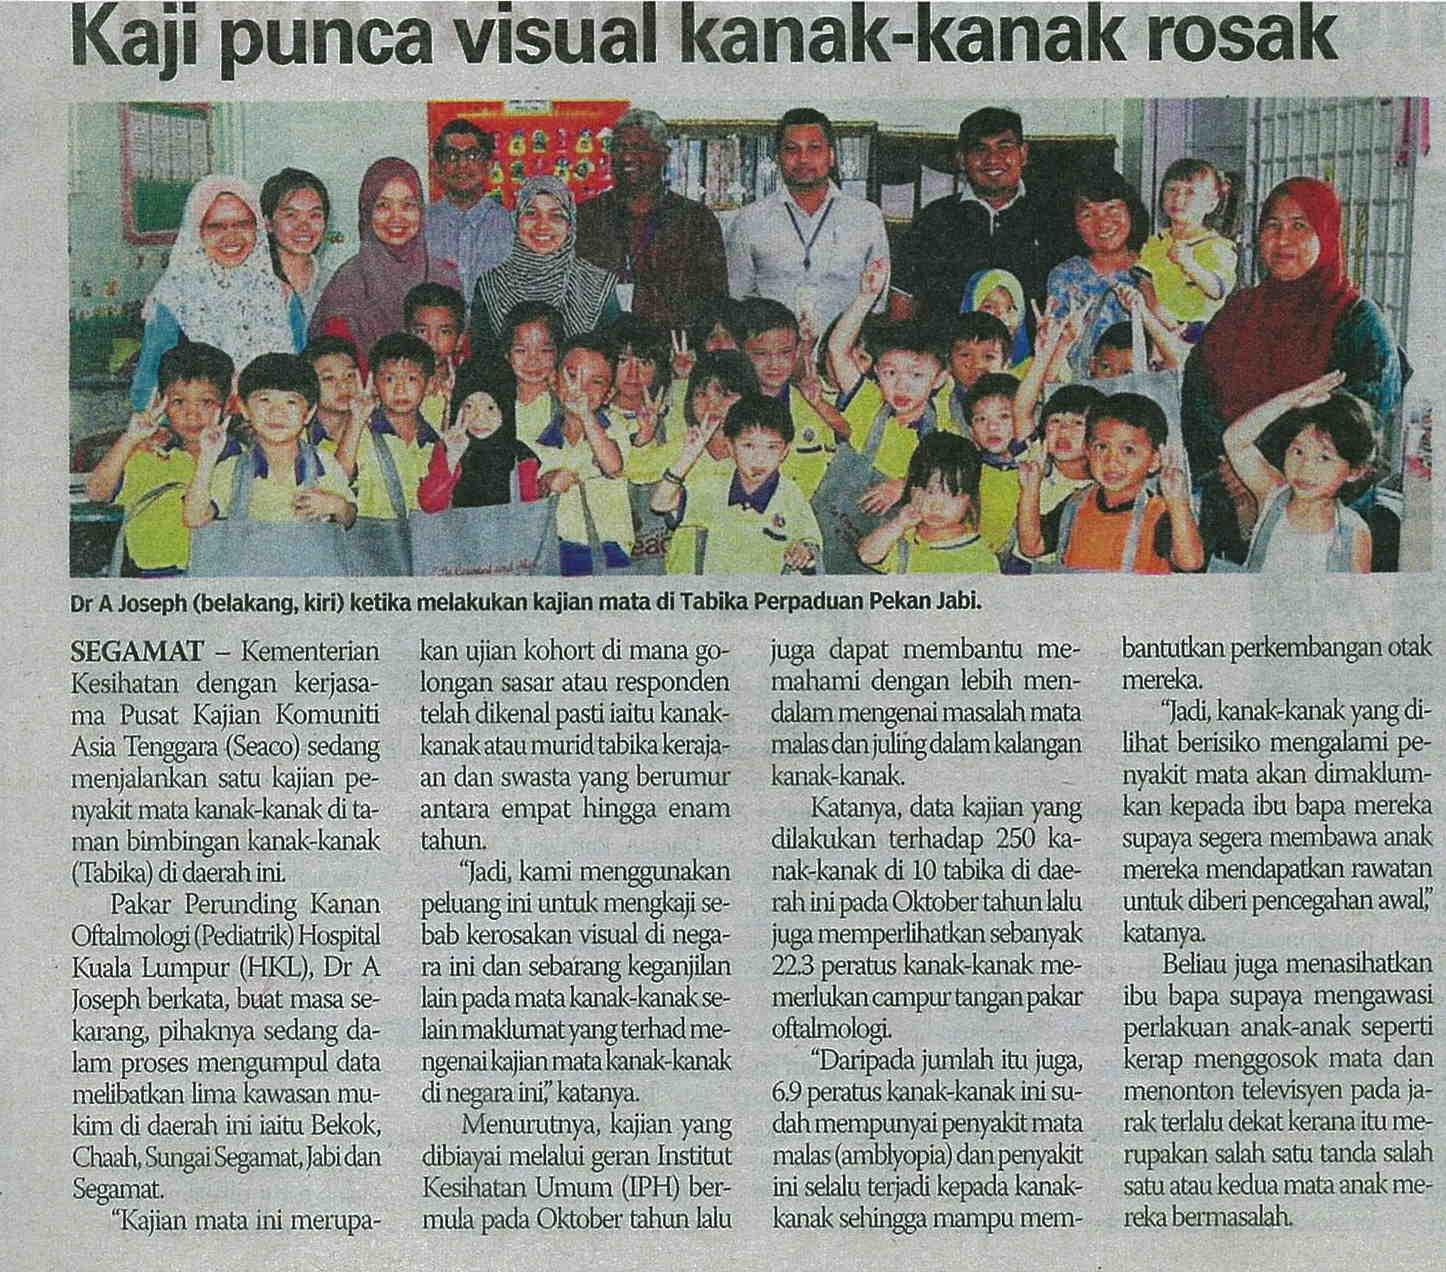 Segamat Paediatric Eye Disease Study (SEGPAEDS) - Sinar Newspaper